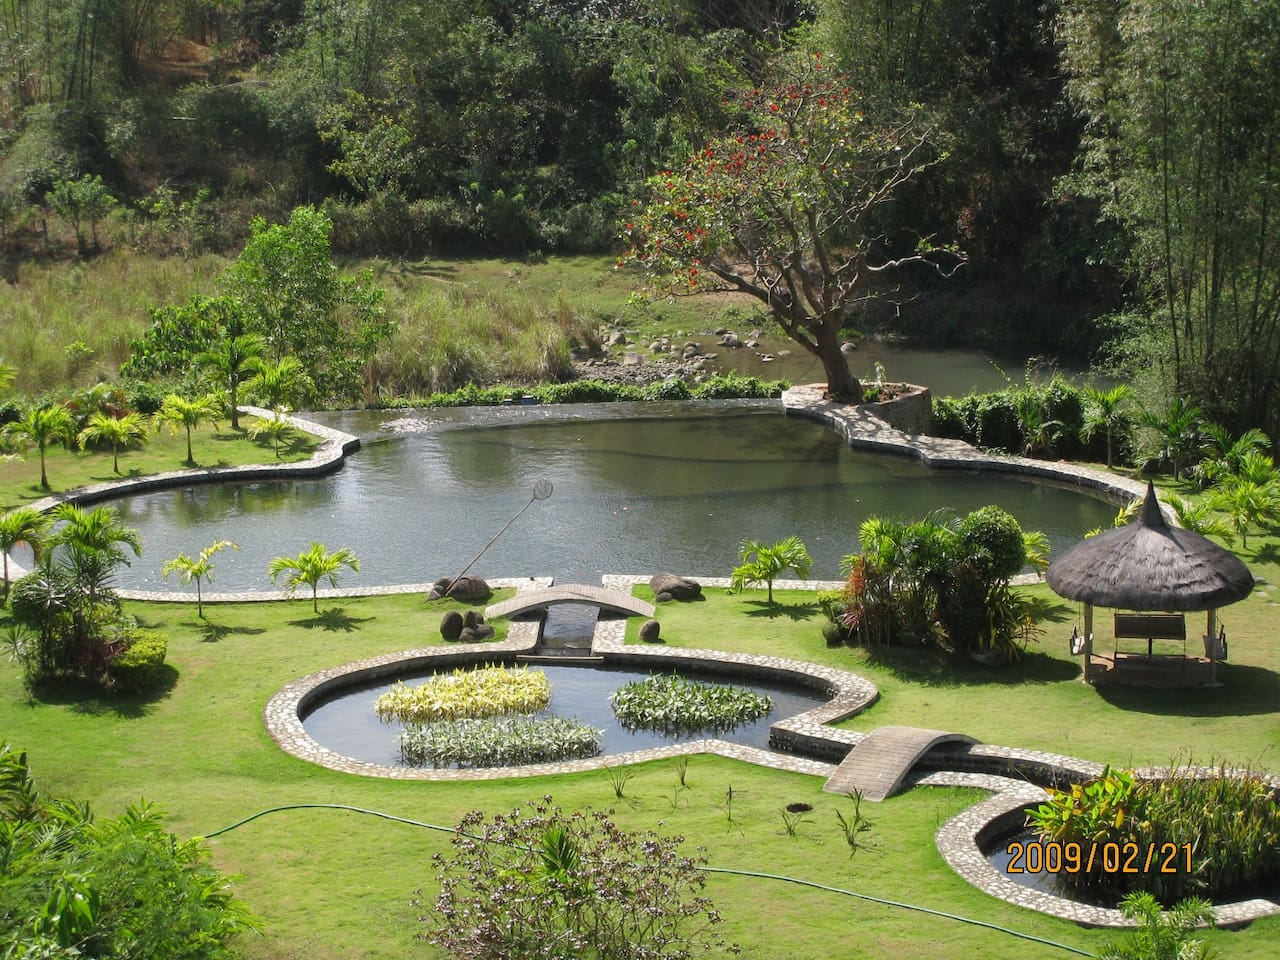 River fed natural pool